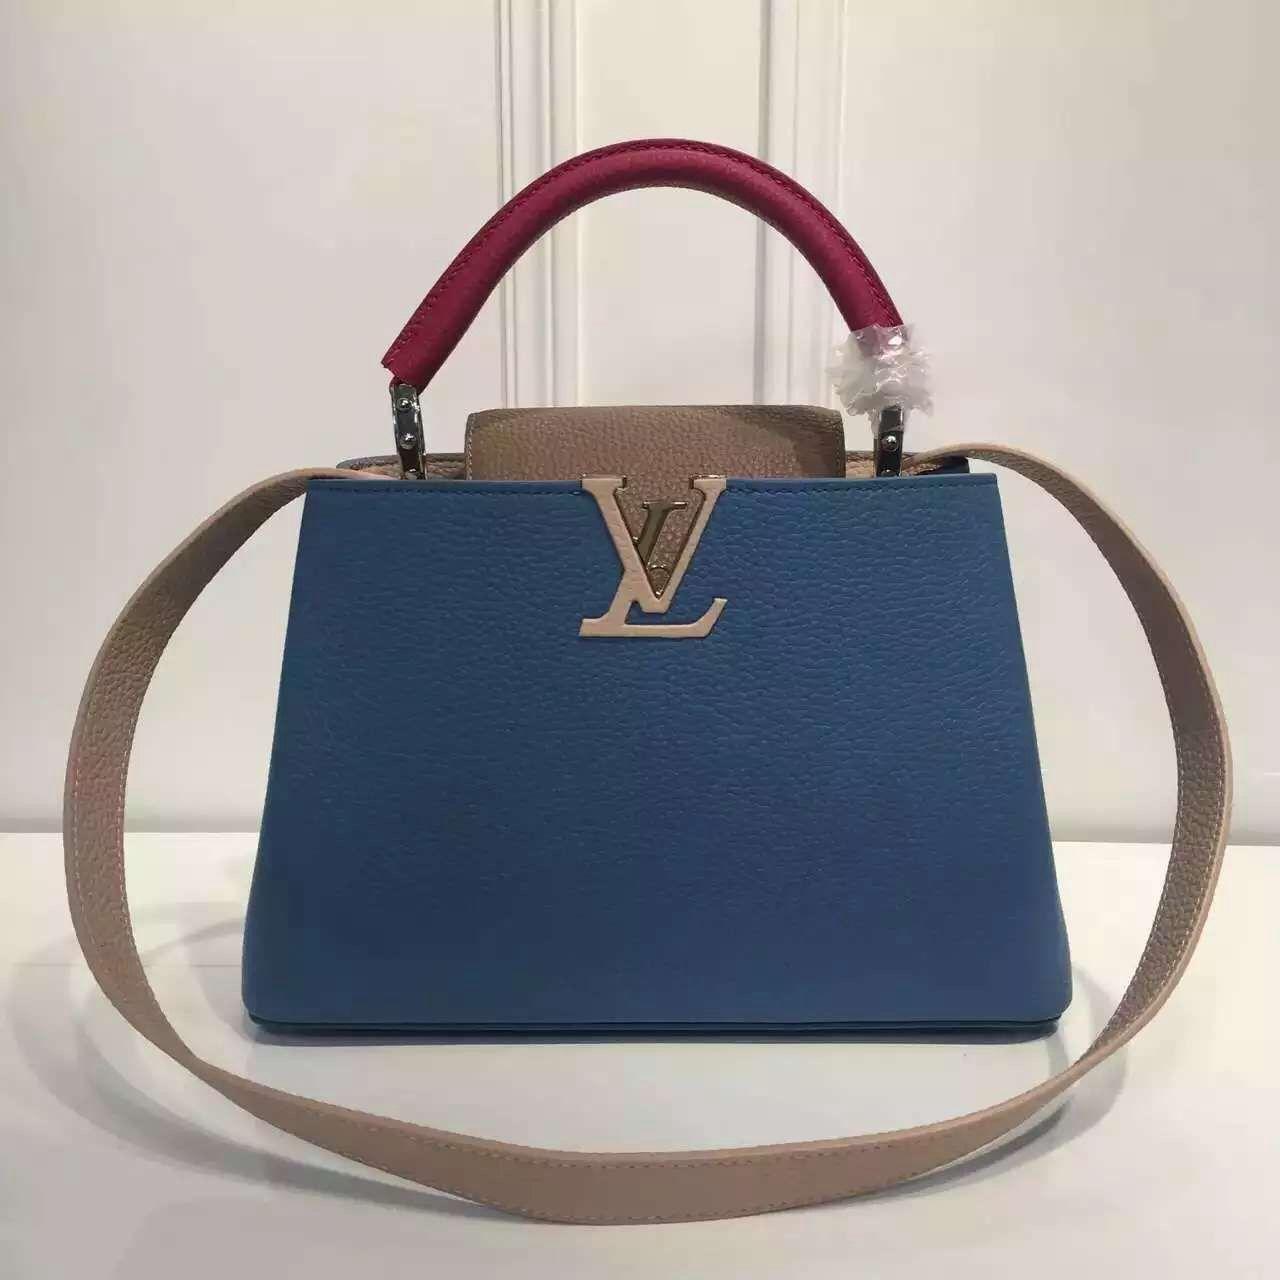 Louis Vuitton Grained Calfskin Multicolor Capucines BB Bag Blue Dune Designer  Bags For Less, b32b61f01c